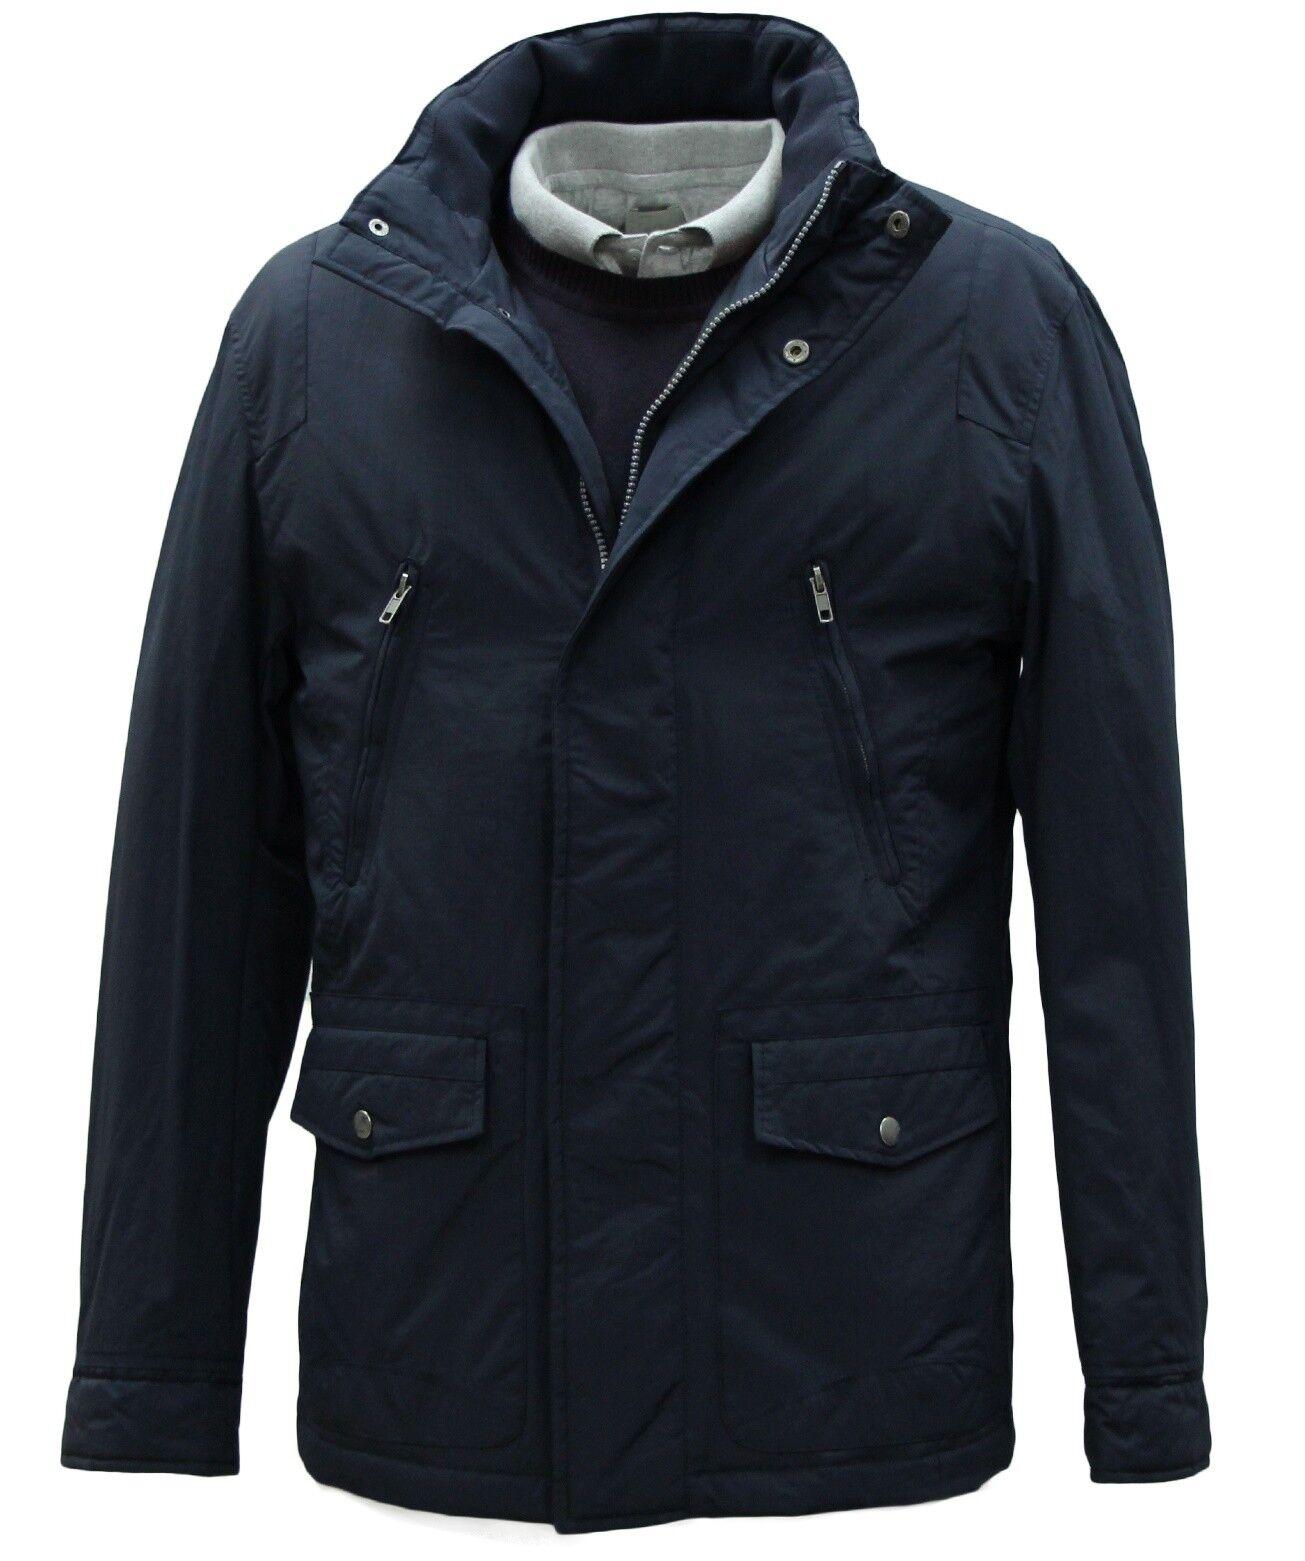 Men's Harry Brown Padded Navy Coat (XL)... sample 1025